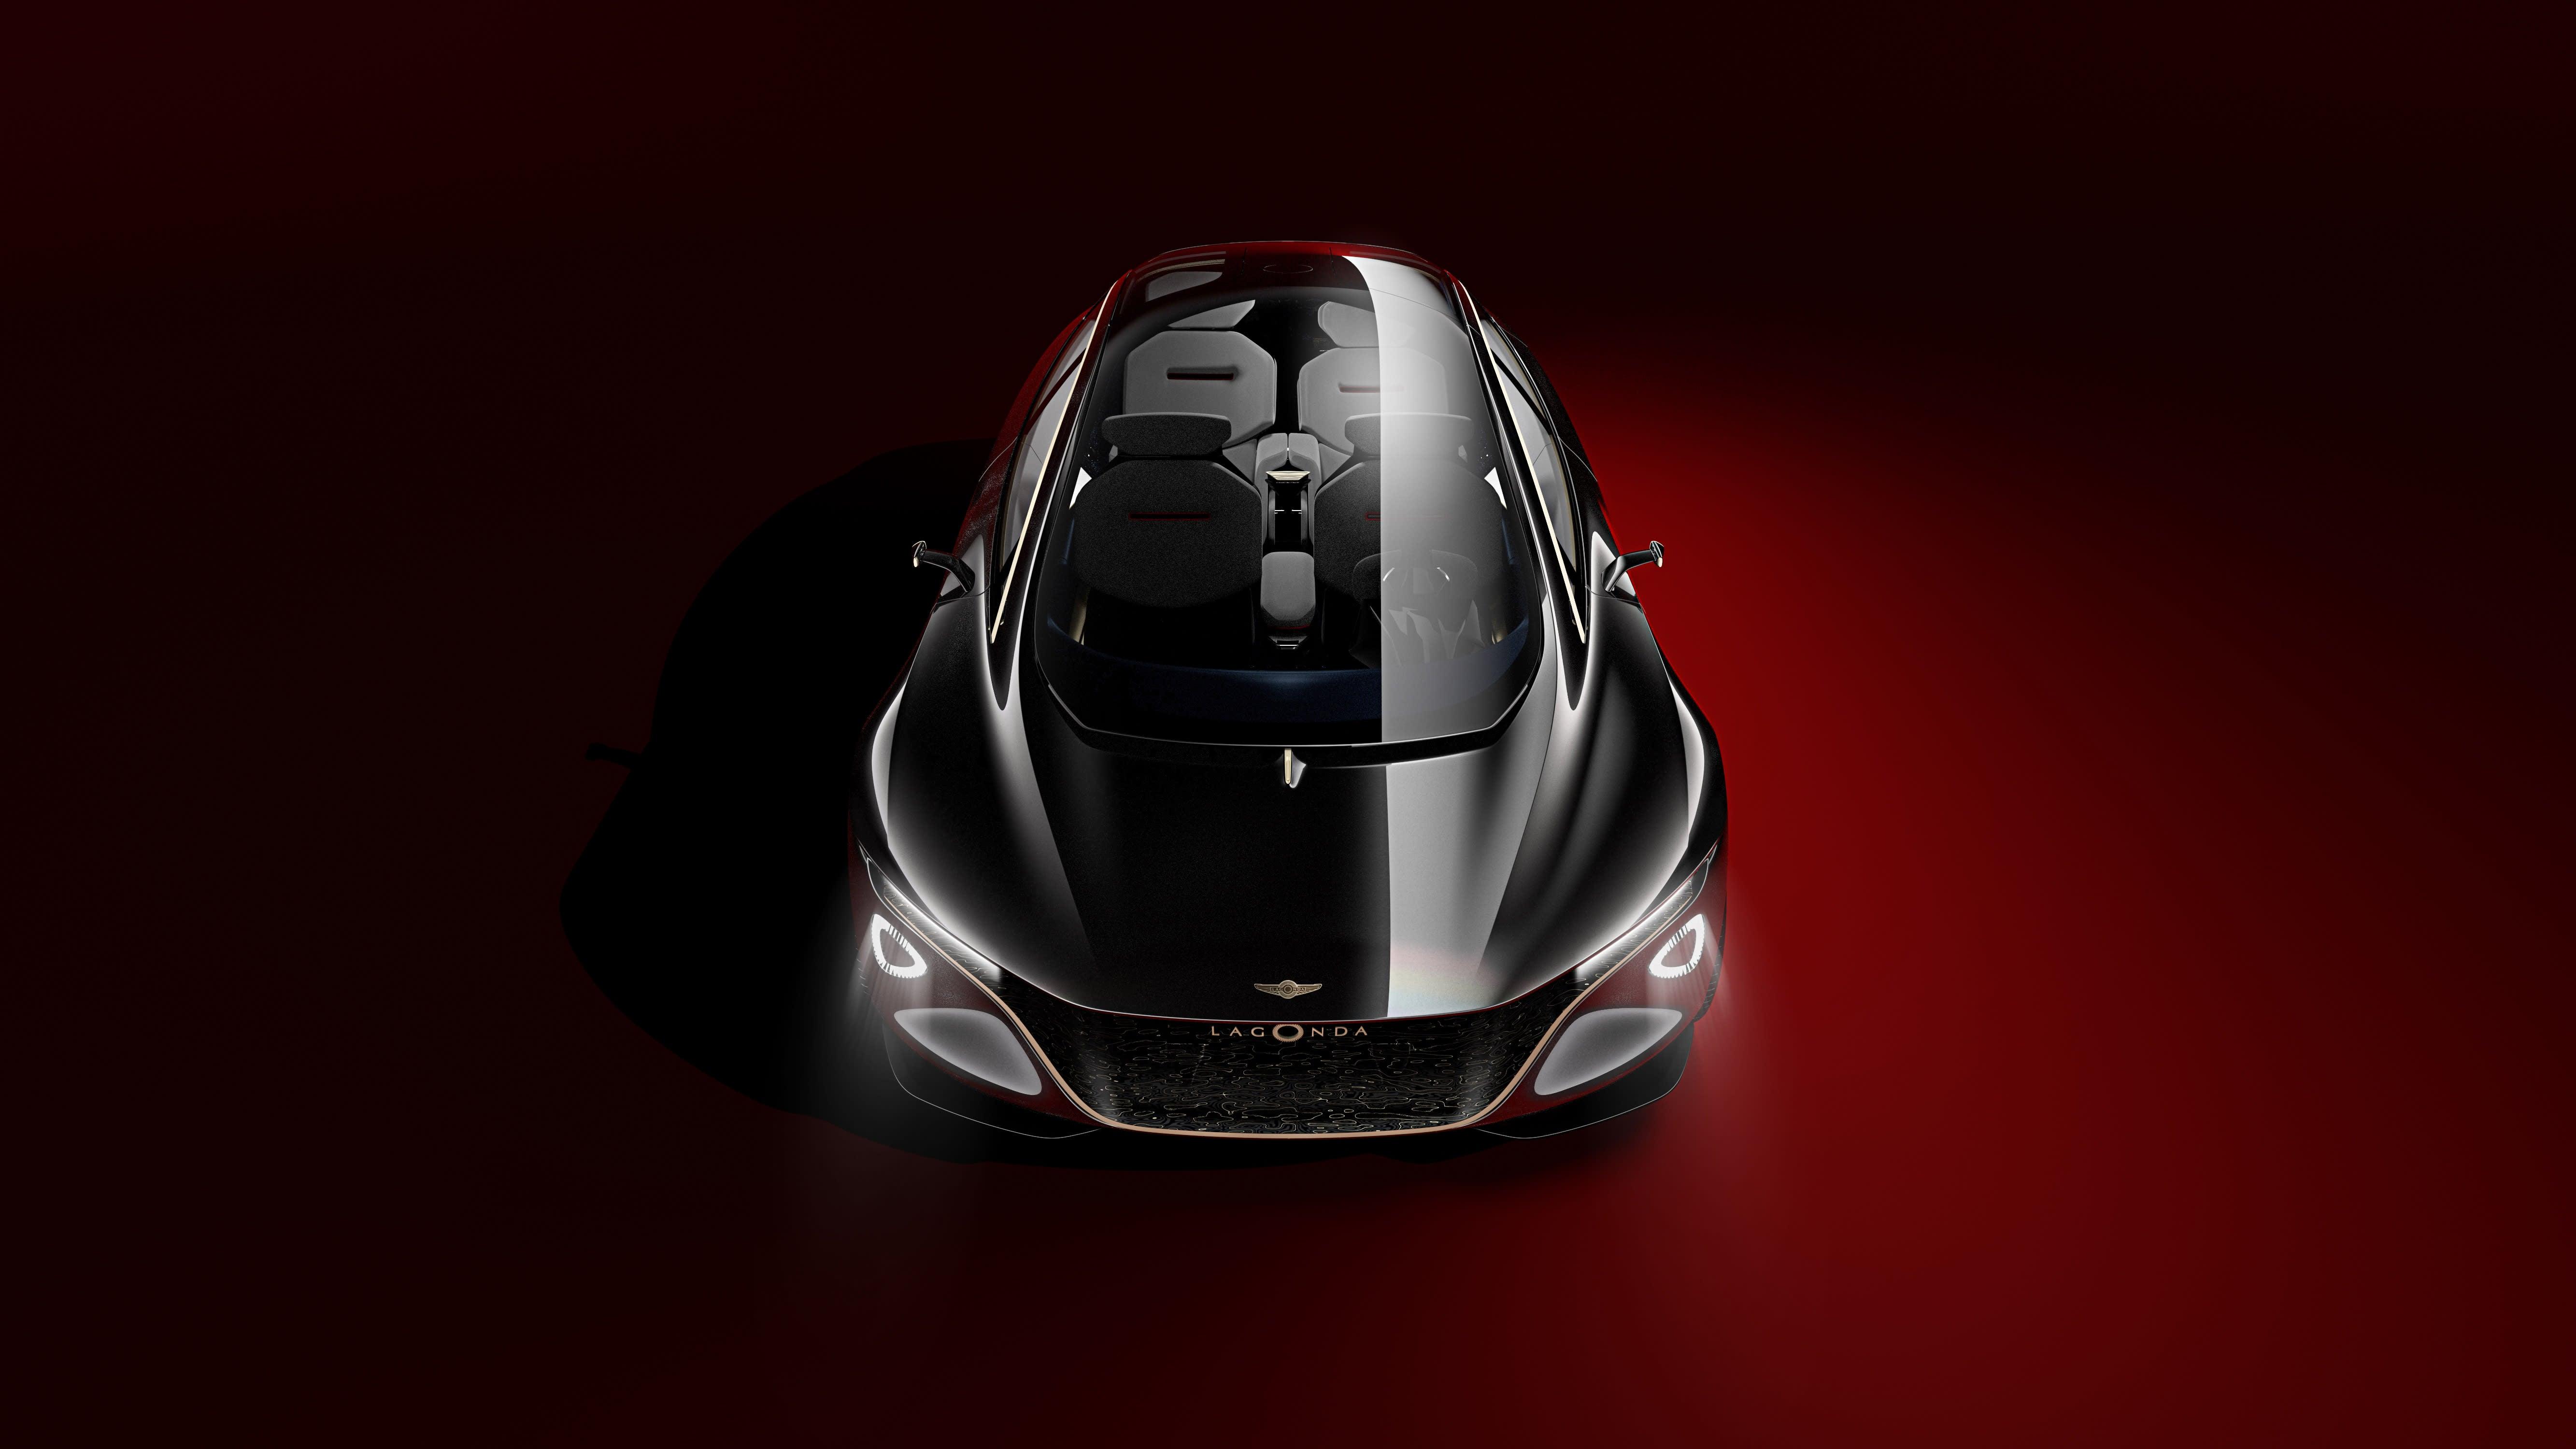 Aston Martin Has A Pretty Good Idea For Making New Electric Cars